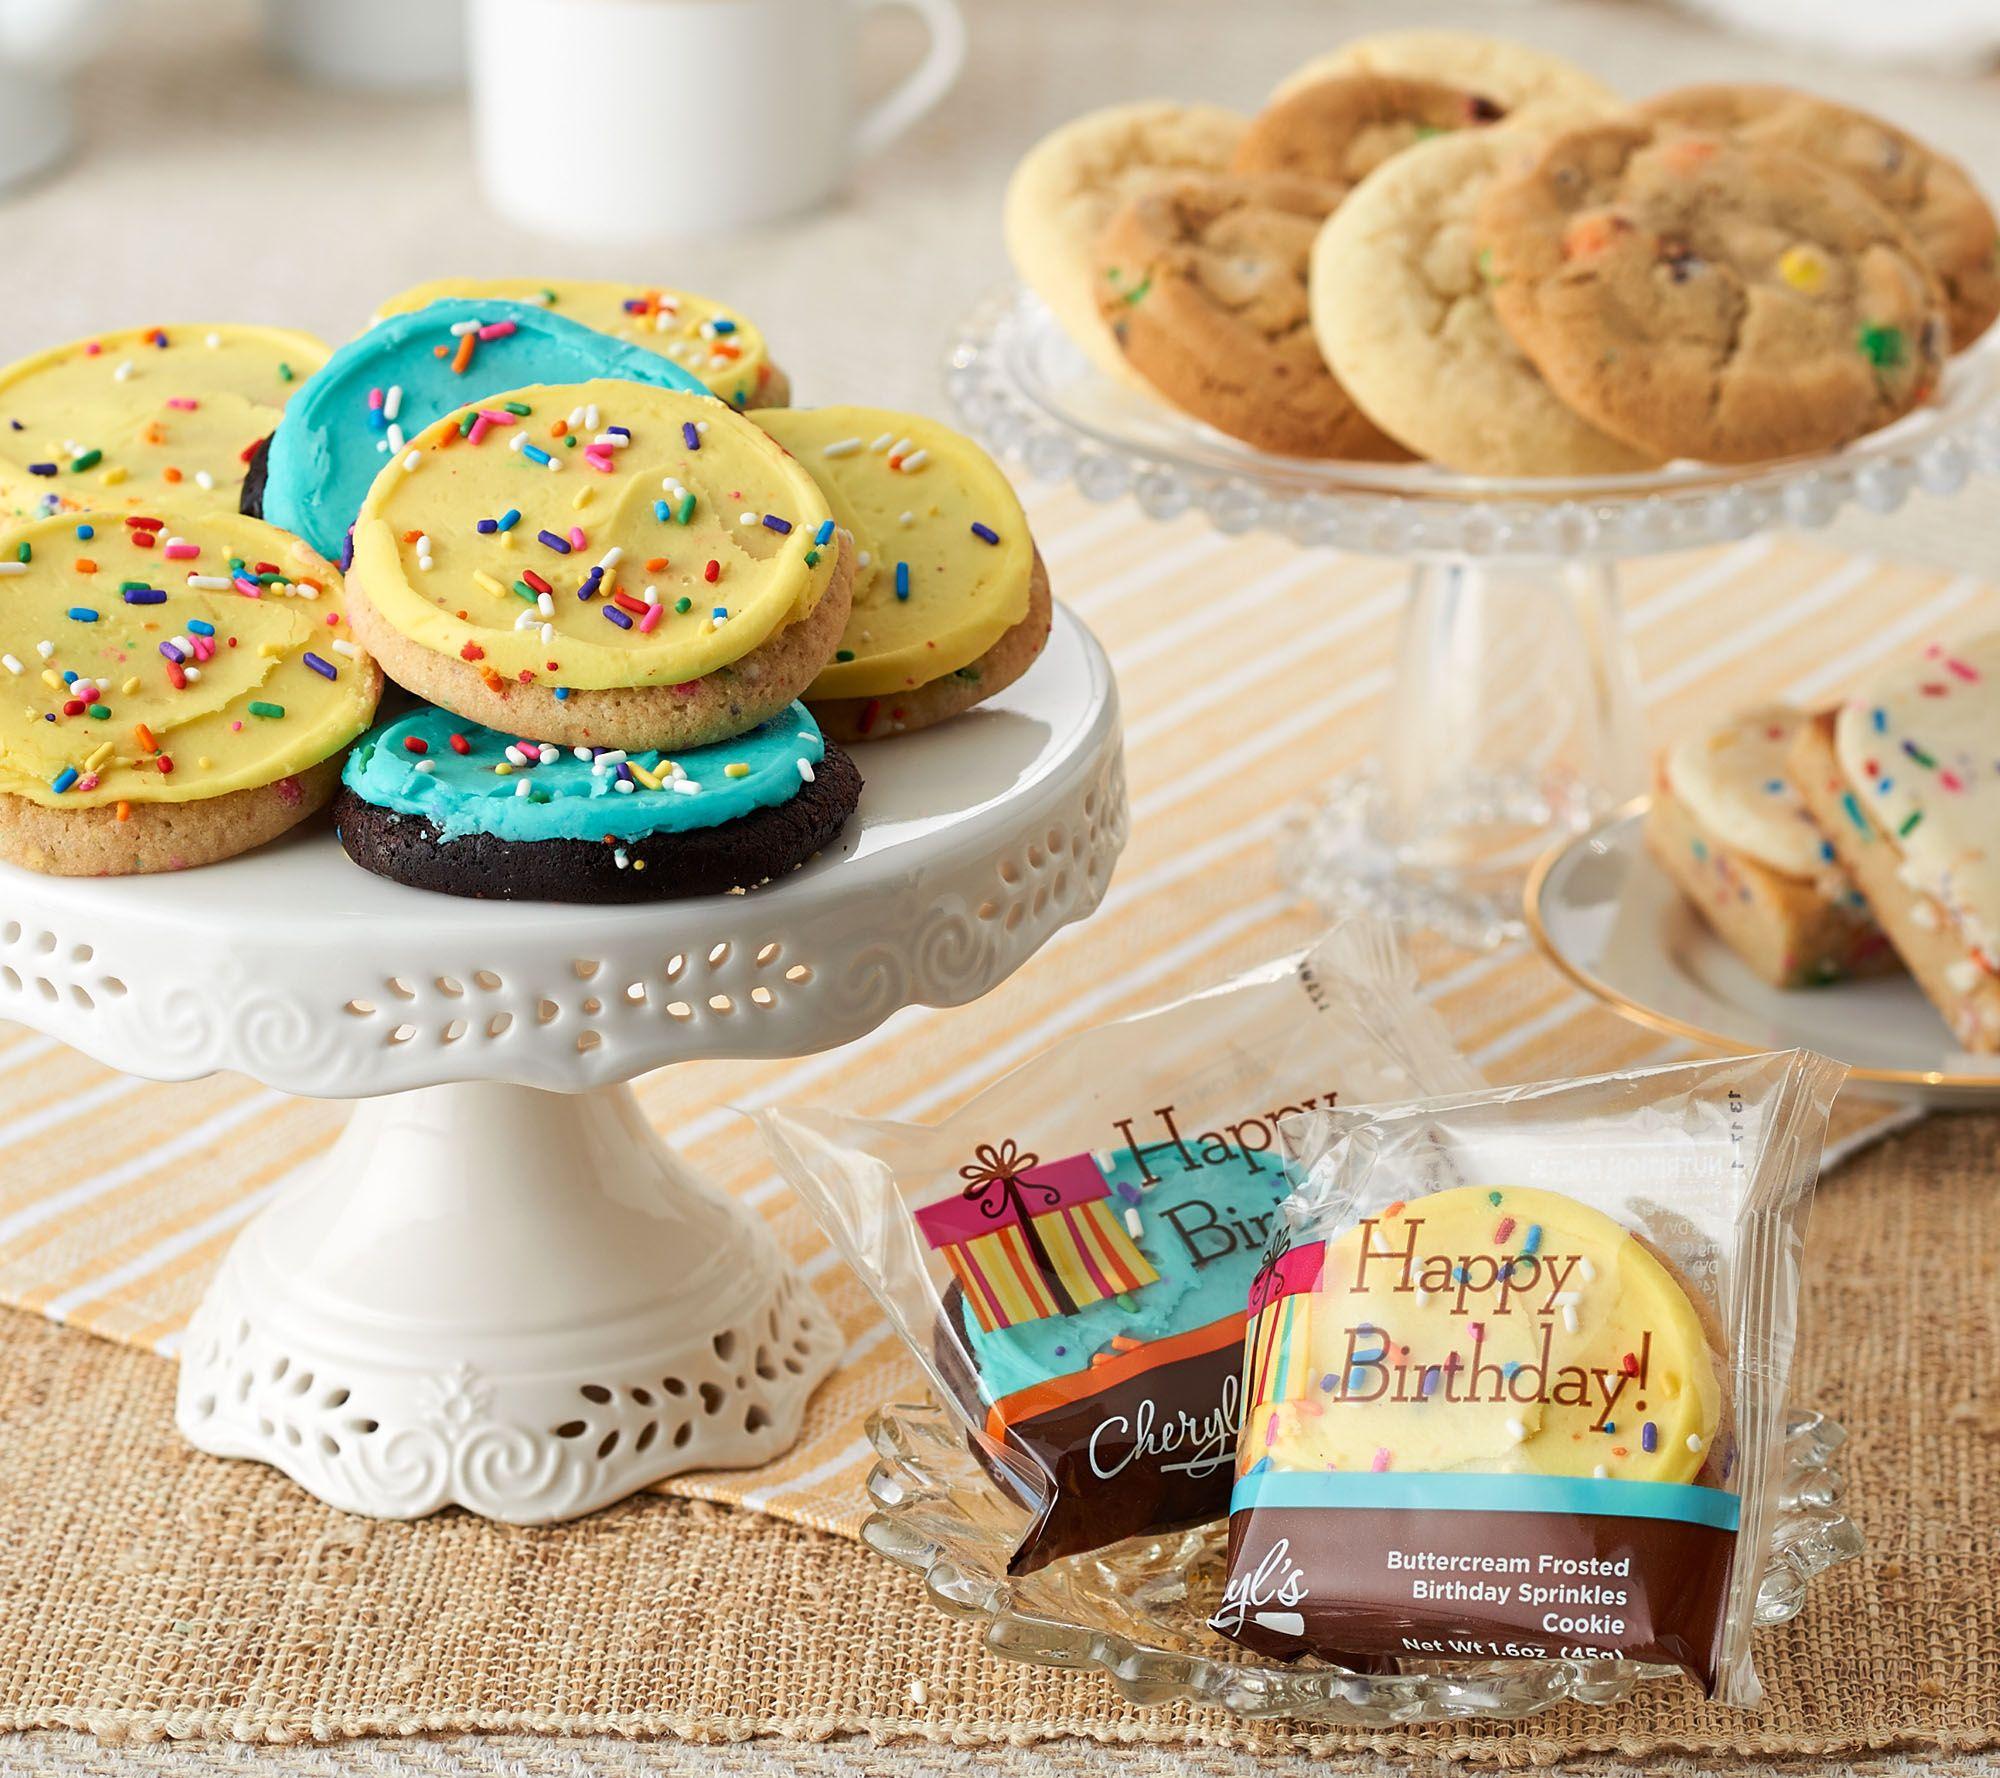 New customer qvc promo code - Cheryl S 22 Piece Birthday Bash Cookie And Brownie Assort M54627